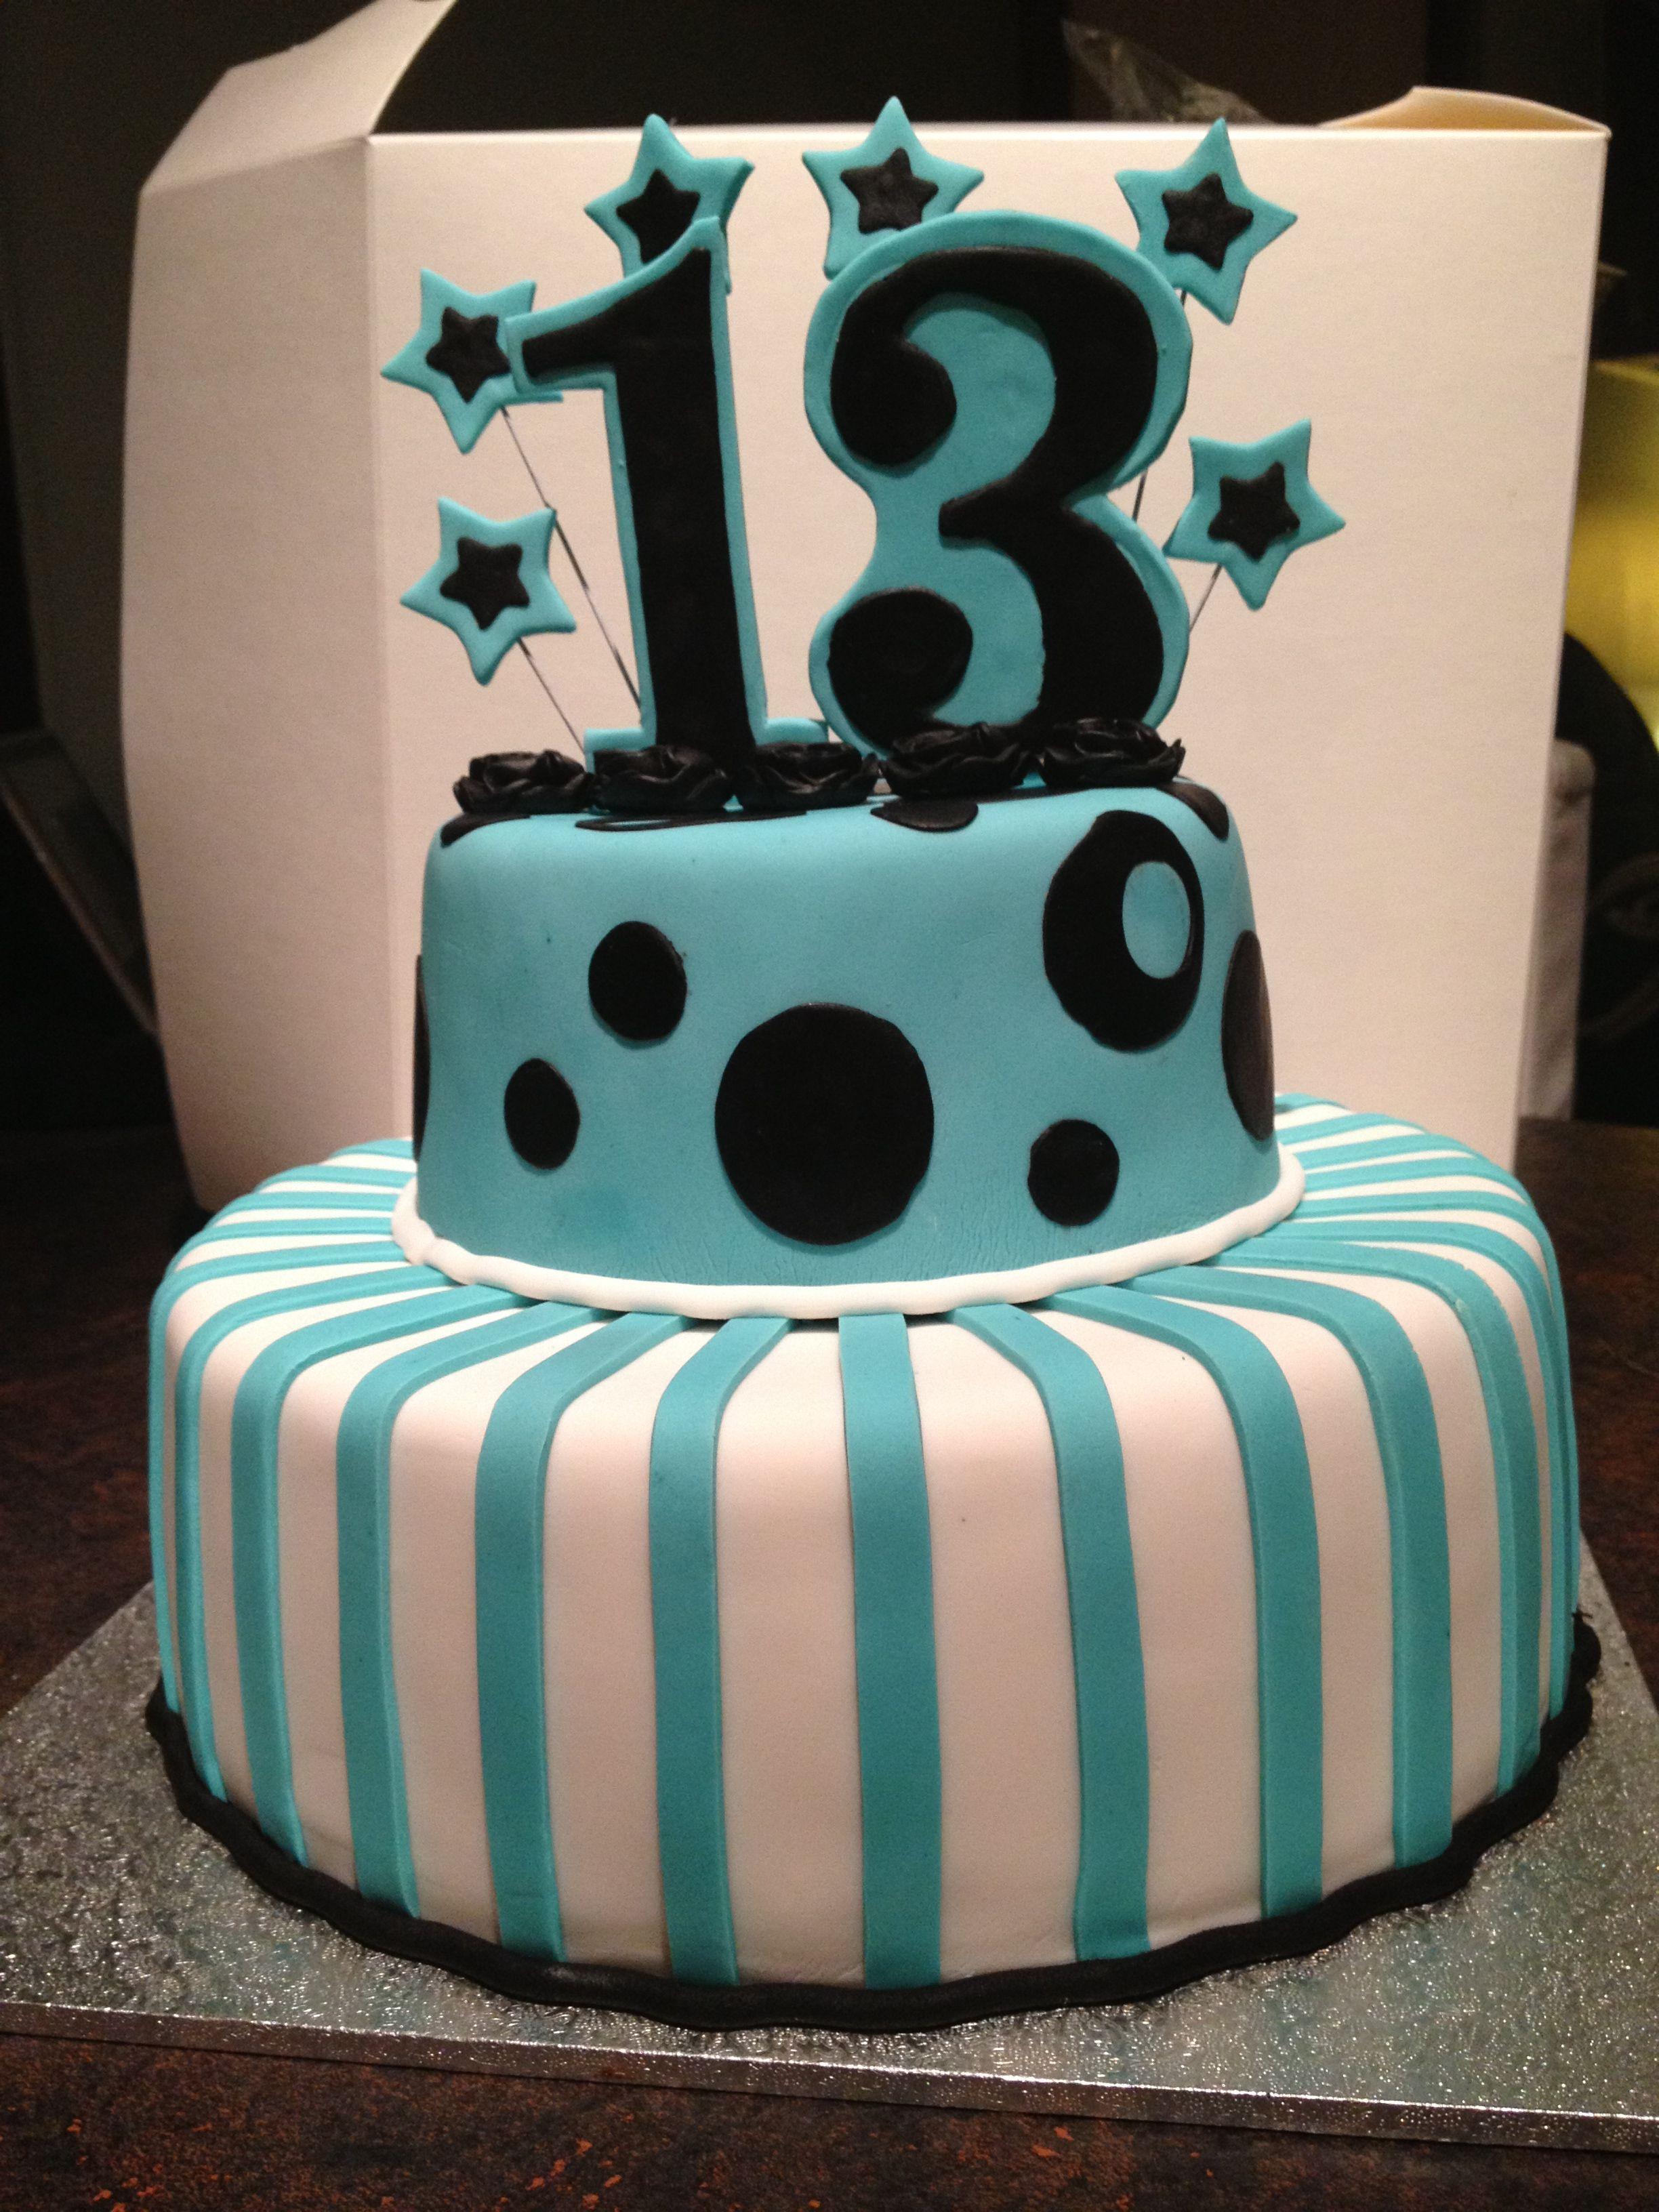 Teal White Black 13th Birthday Cake